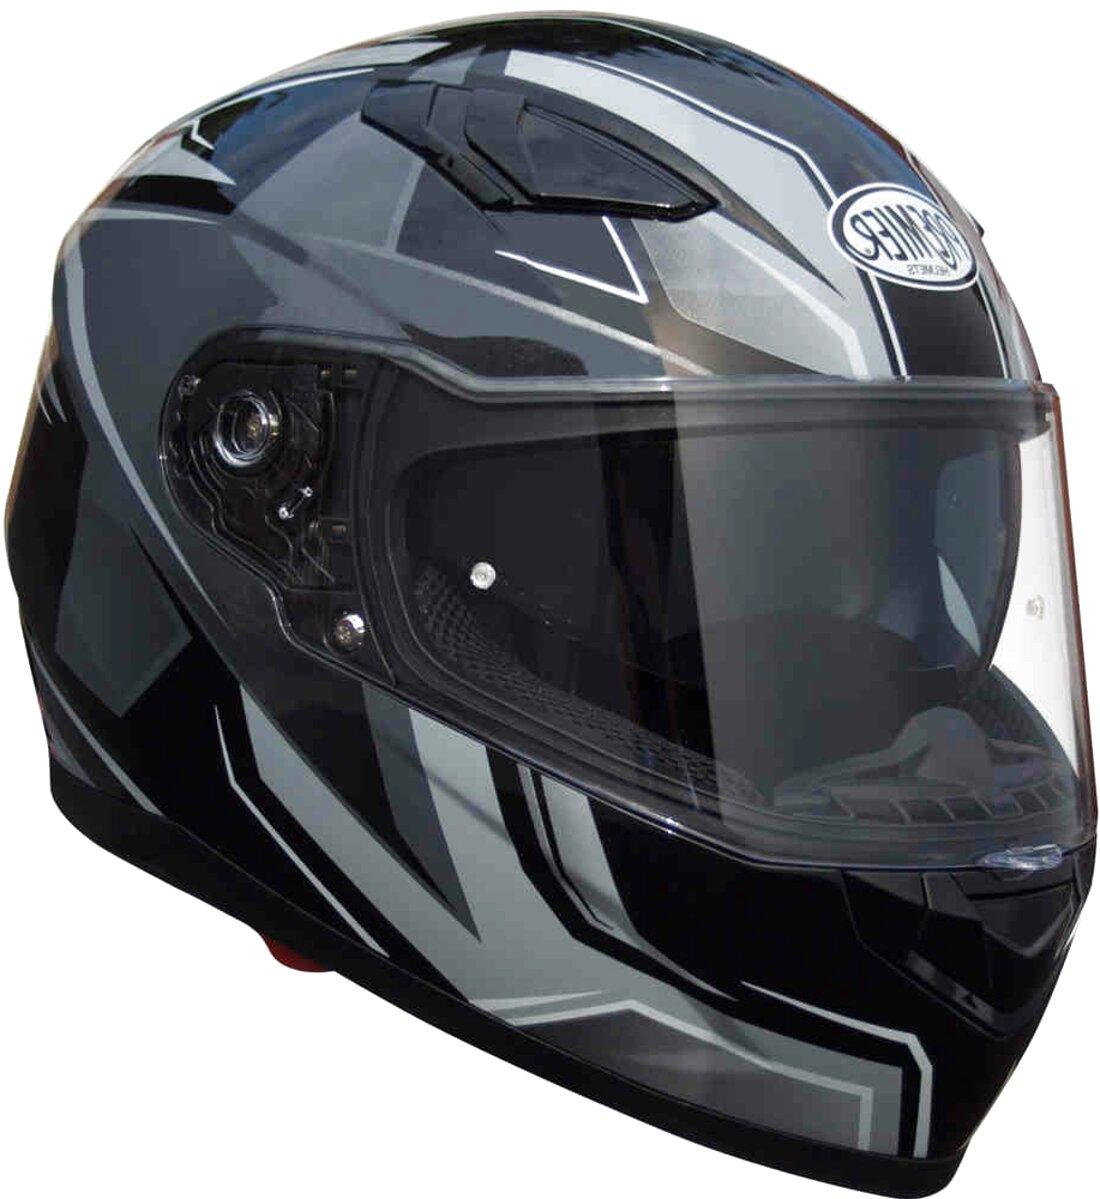 viper helmets for sale